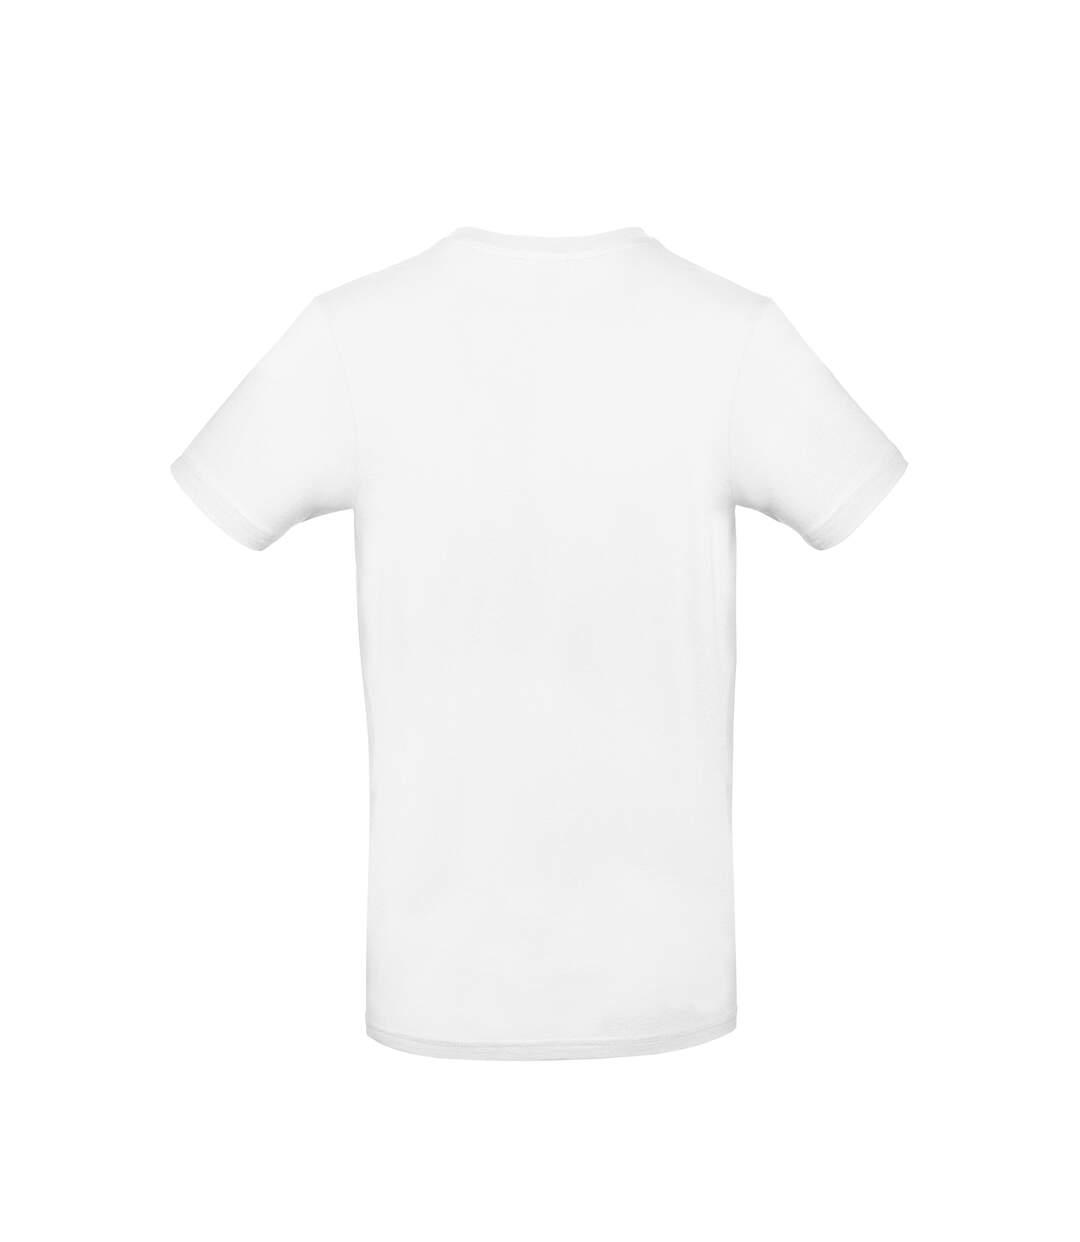 B&C Mens #E190 Tee (Ash Grey) - UTBC3911